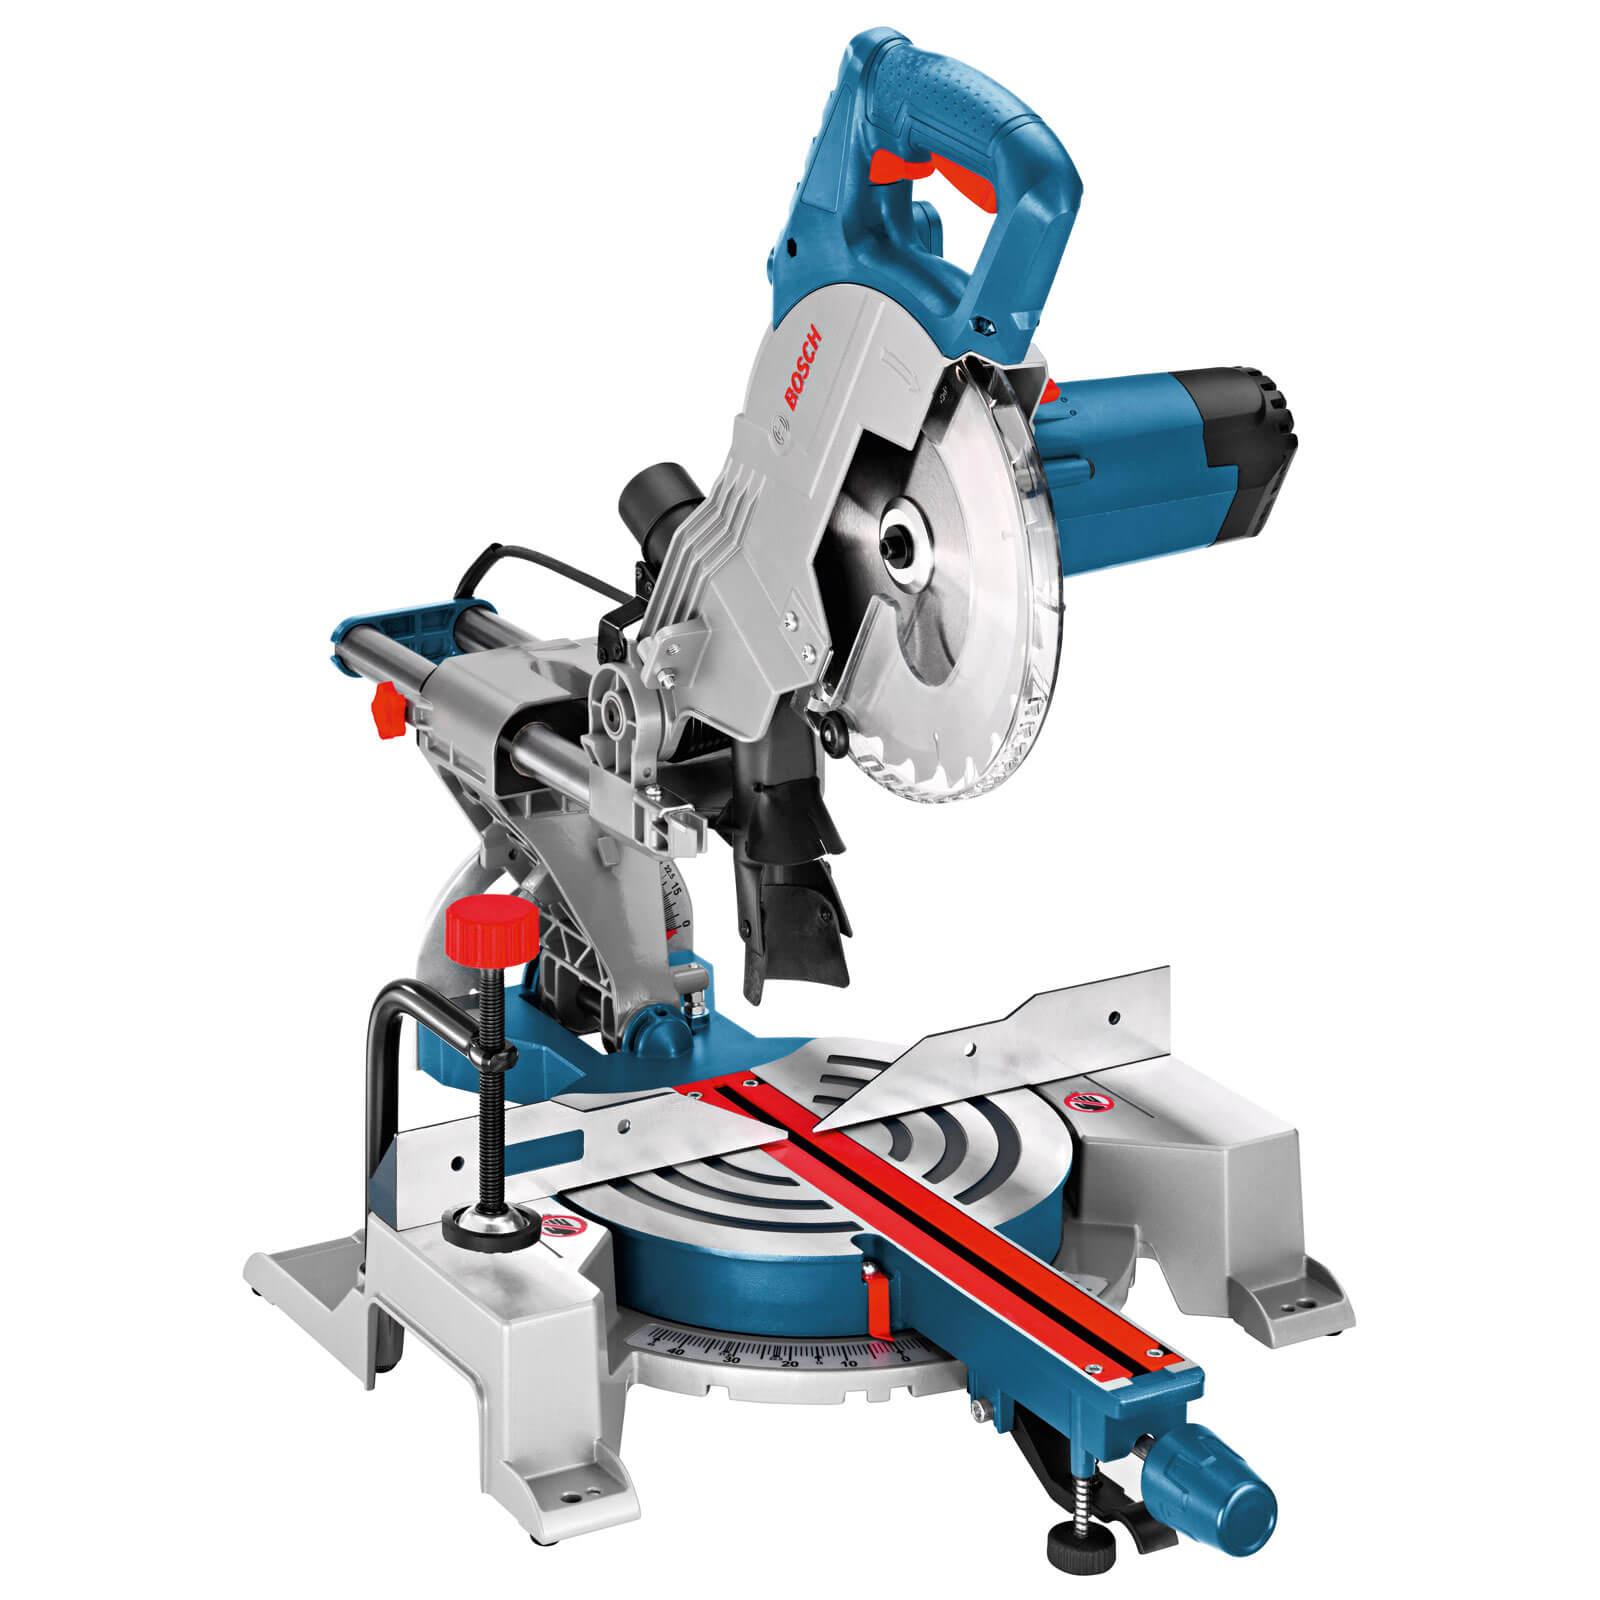 Bosch GCM800SJ Sliding Mitre Saw 216mm 1400W 110V